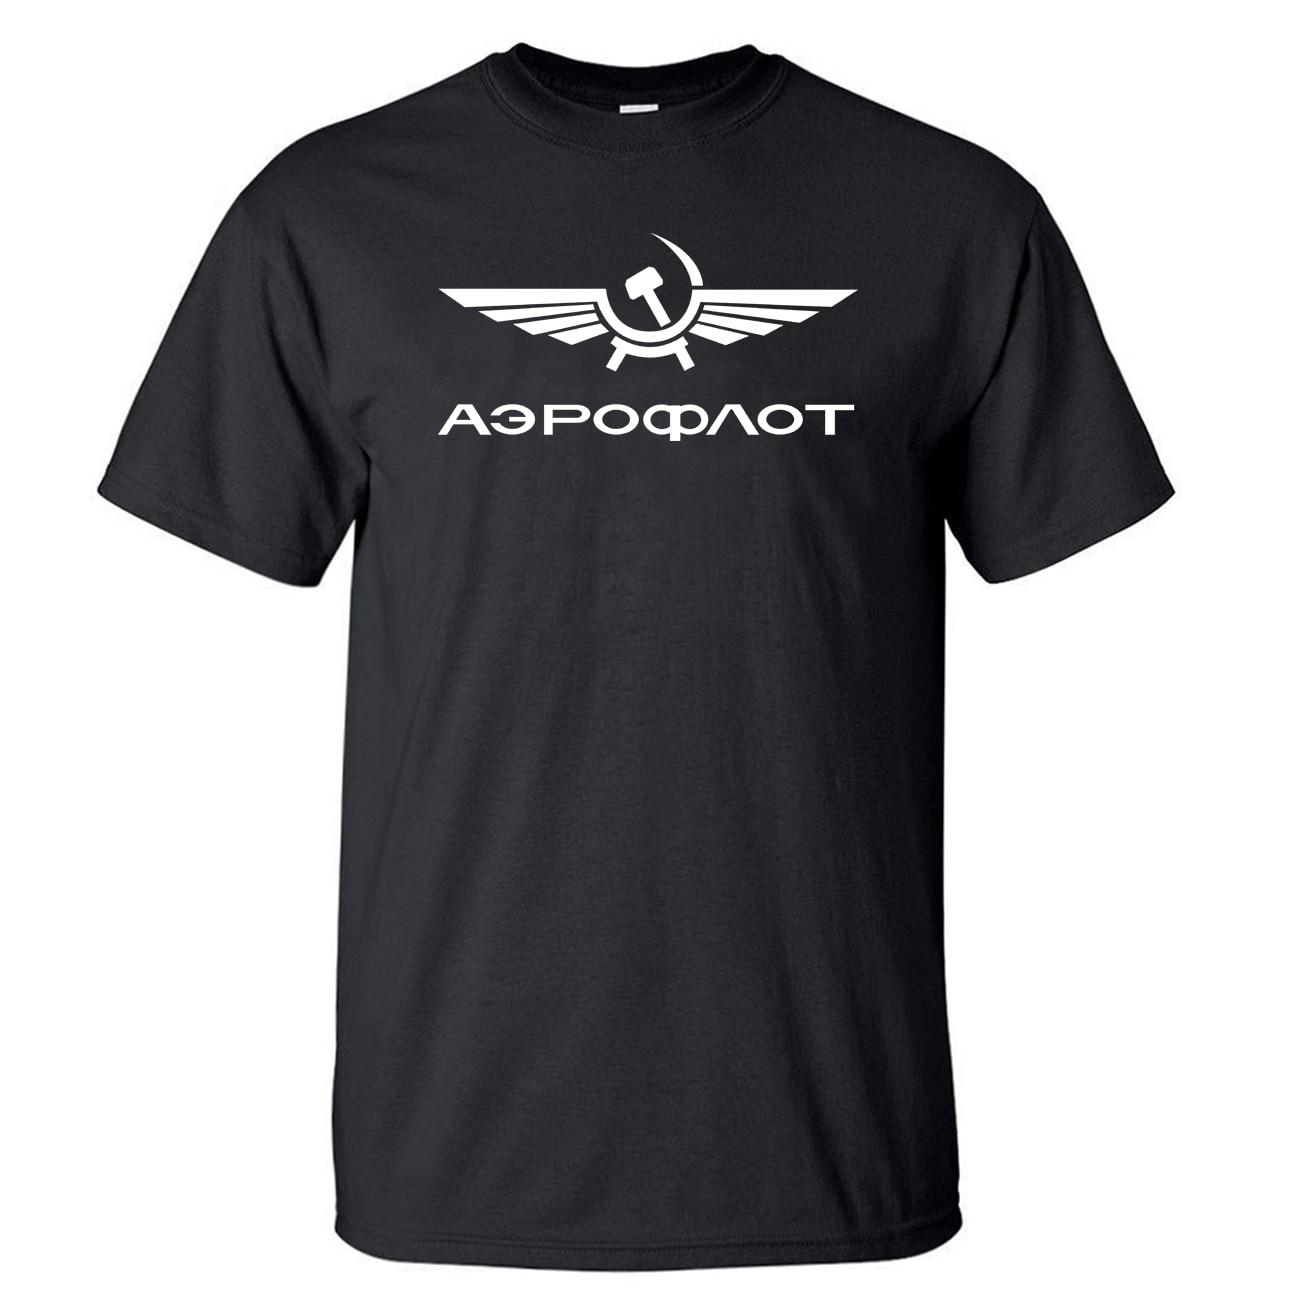 Aeroflot CCCP AVIACIÓN Civil USSR Rusia AIRFORCE camiseta hombres camiseta camisetas verano algodón manga corta negro blanco camiseta camisetas